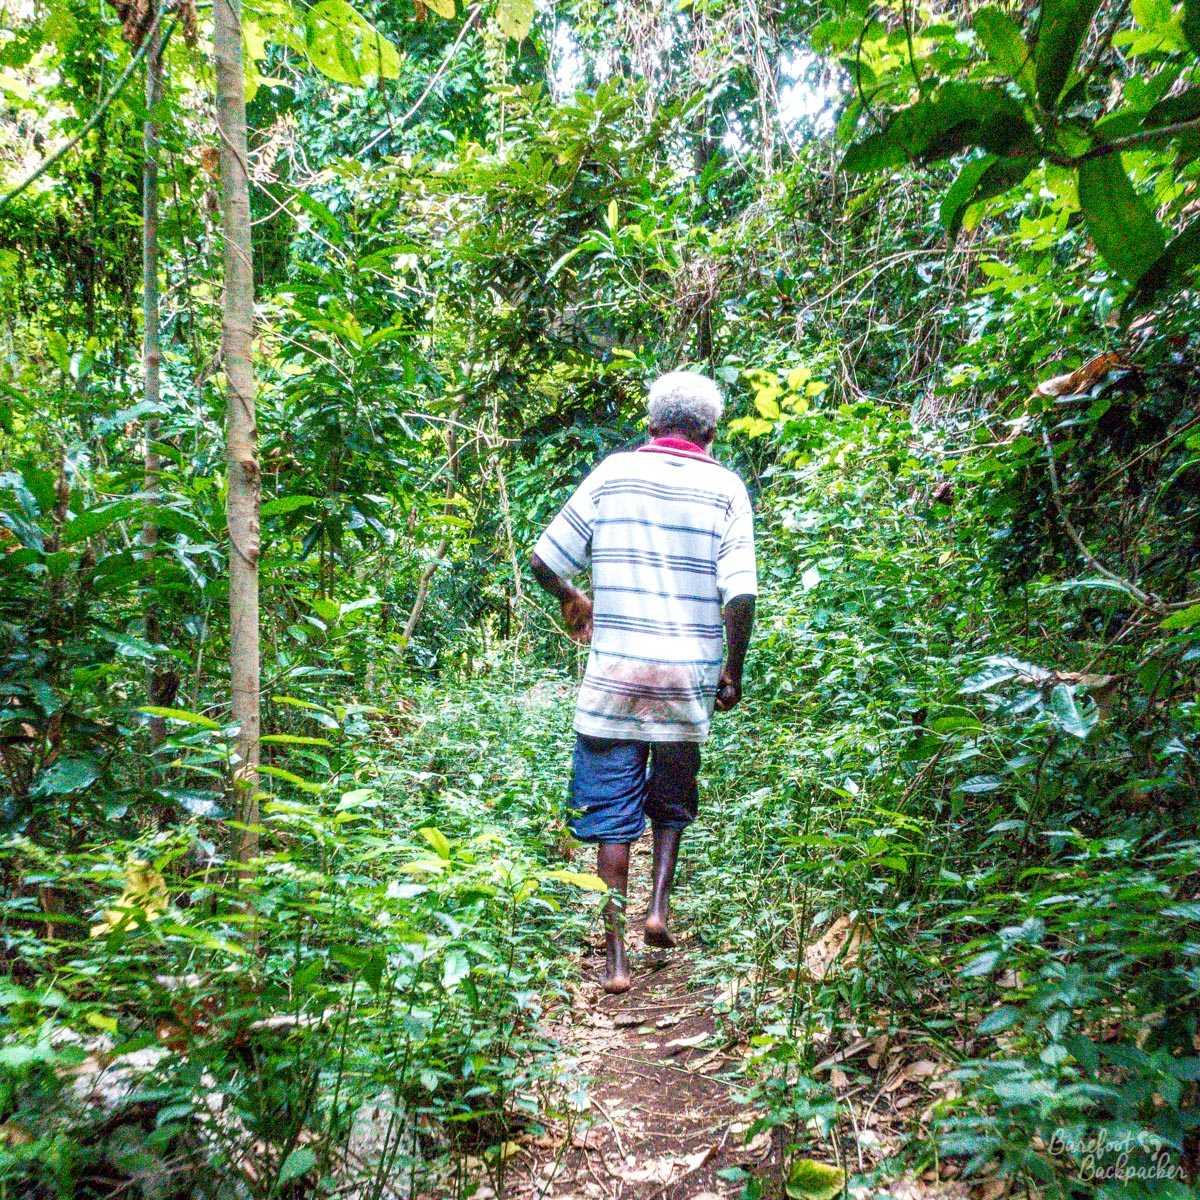 The guide to the Losinwei waterfall, trekking barefoot.